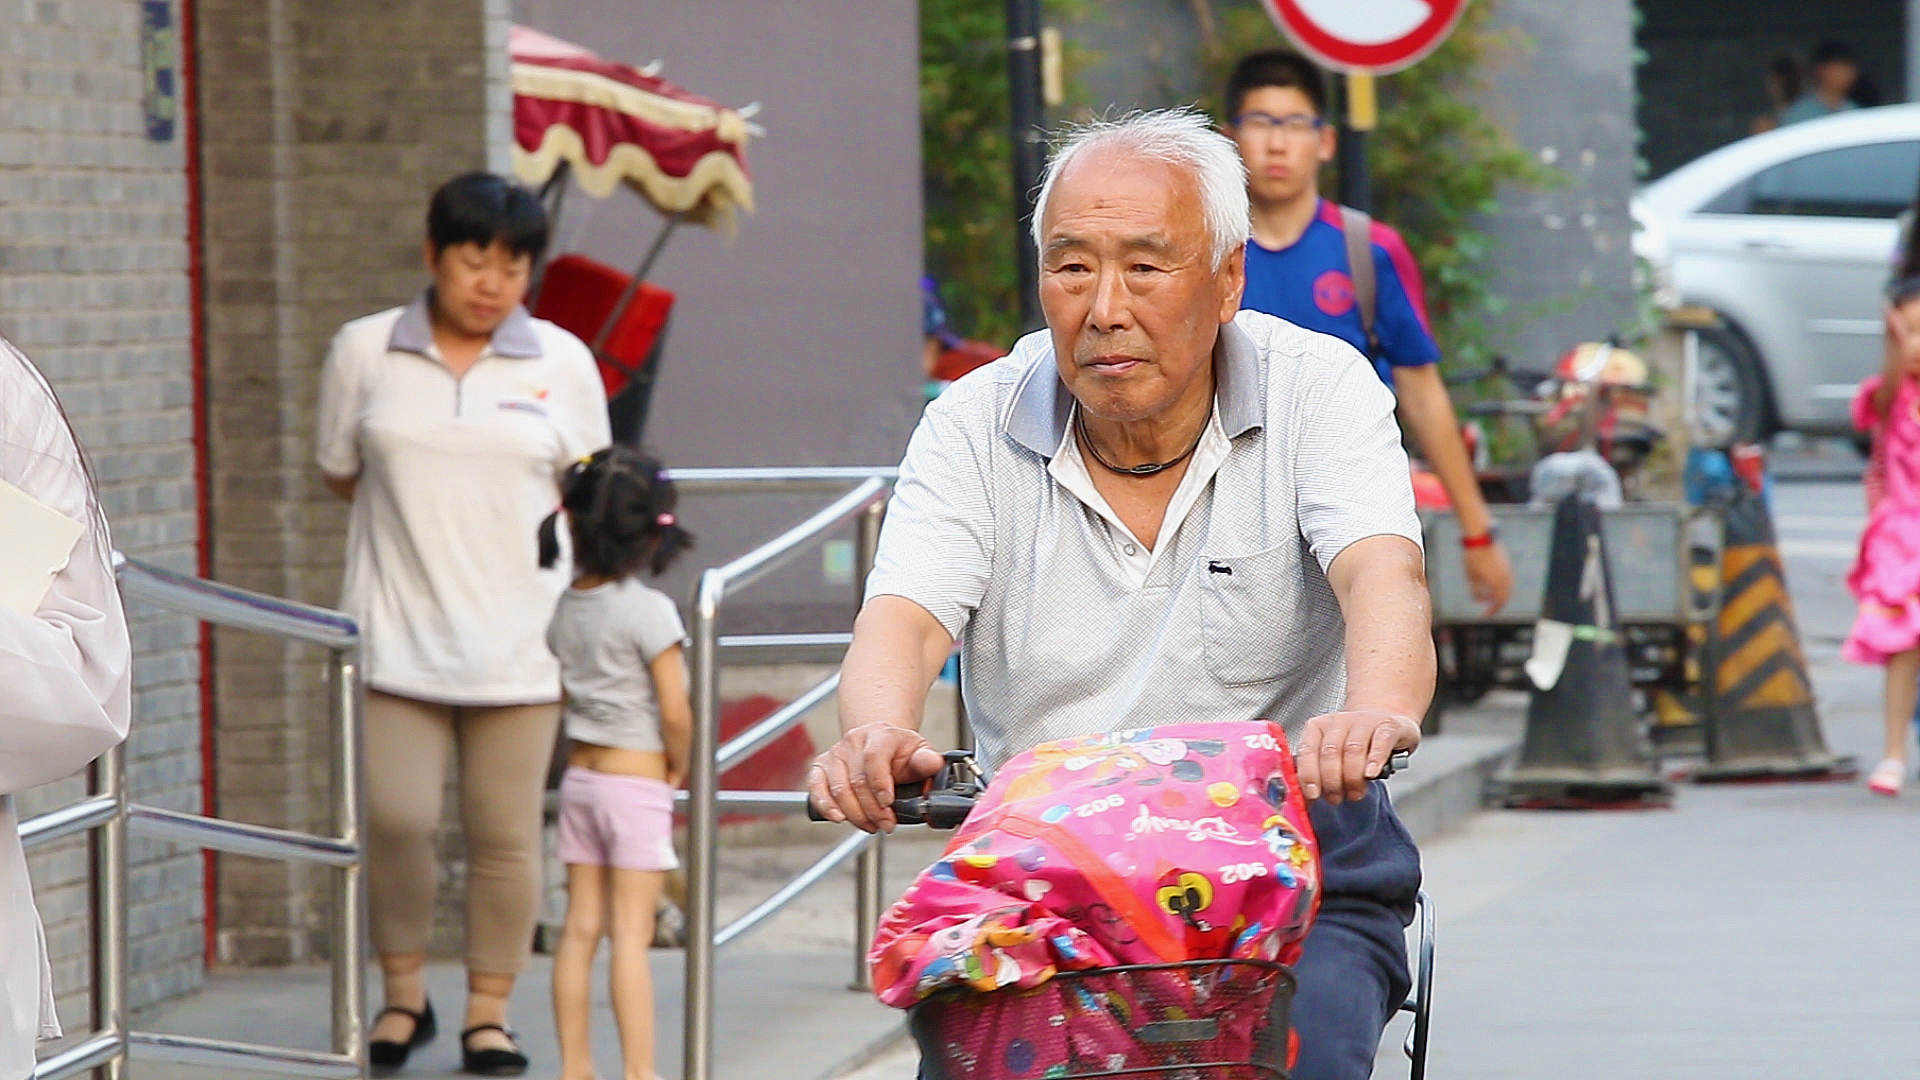 Chine, Pékin, Hutong, chinois, vélo